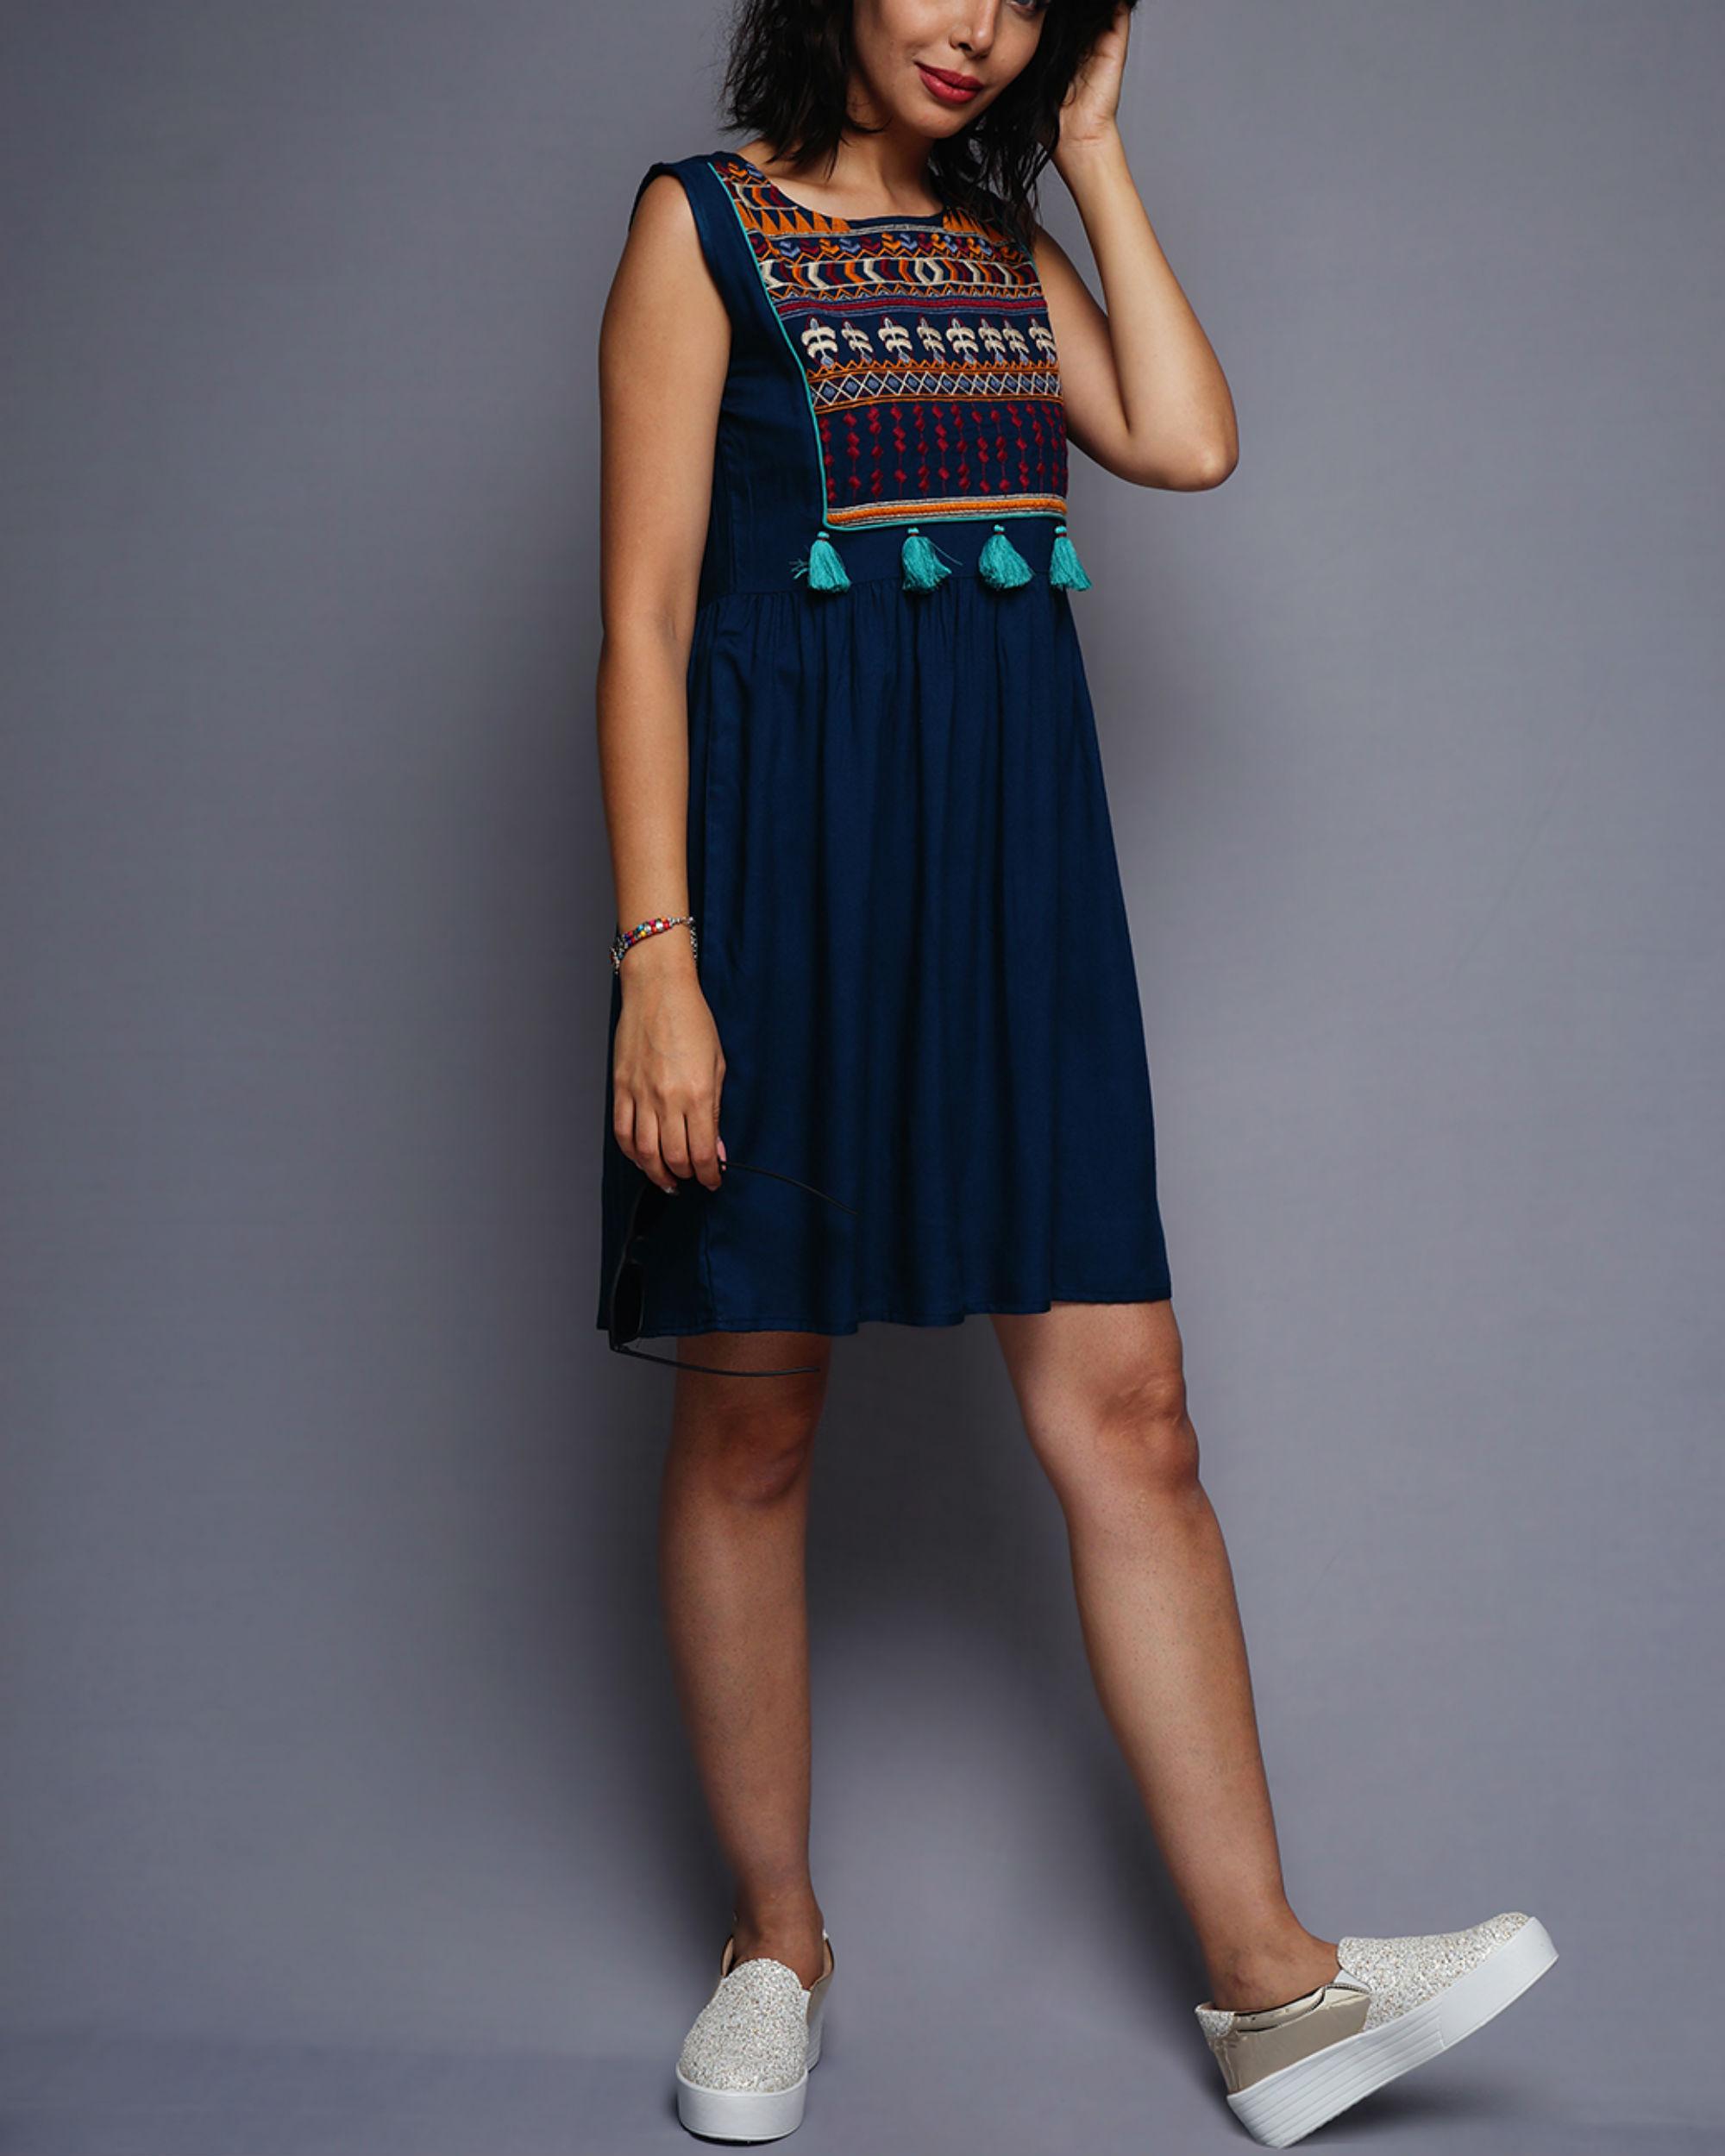 Tasseled short dress